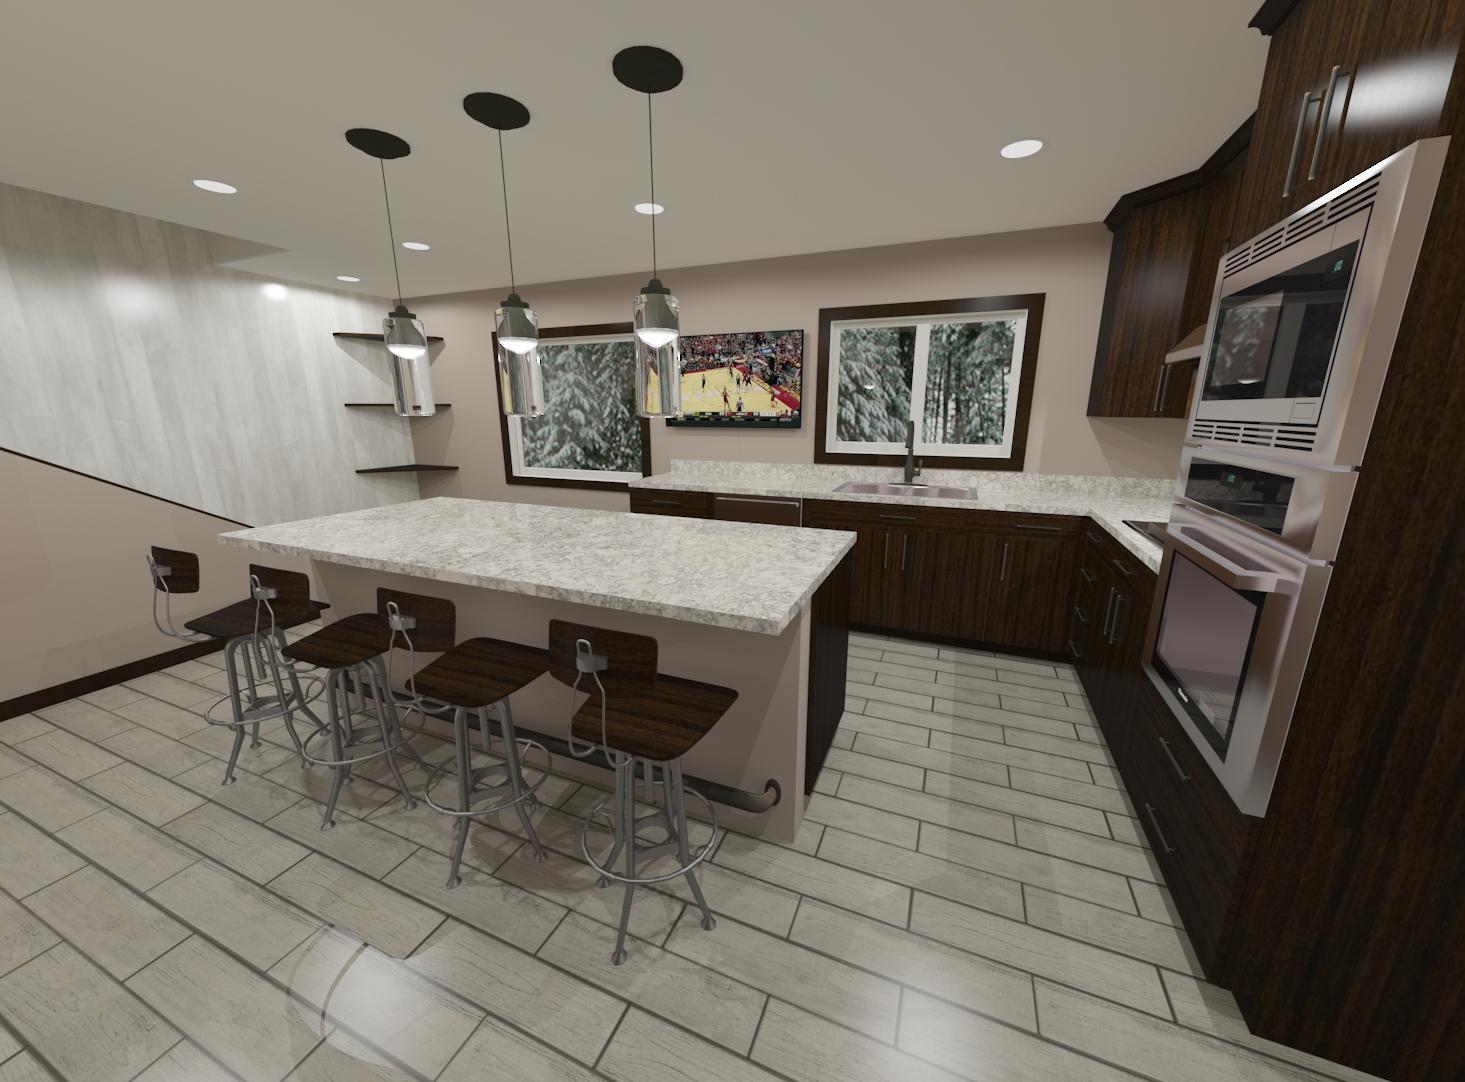 Stensland-Kitchen-Laundry-2.2.jpg